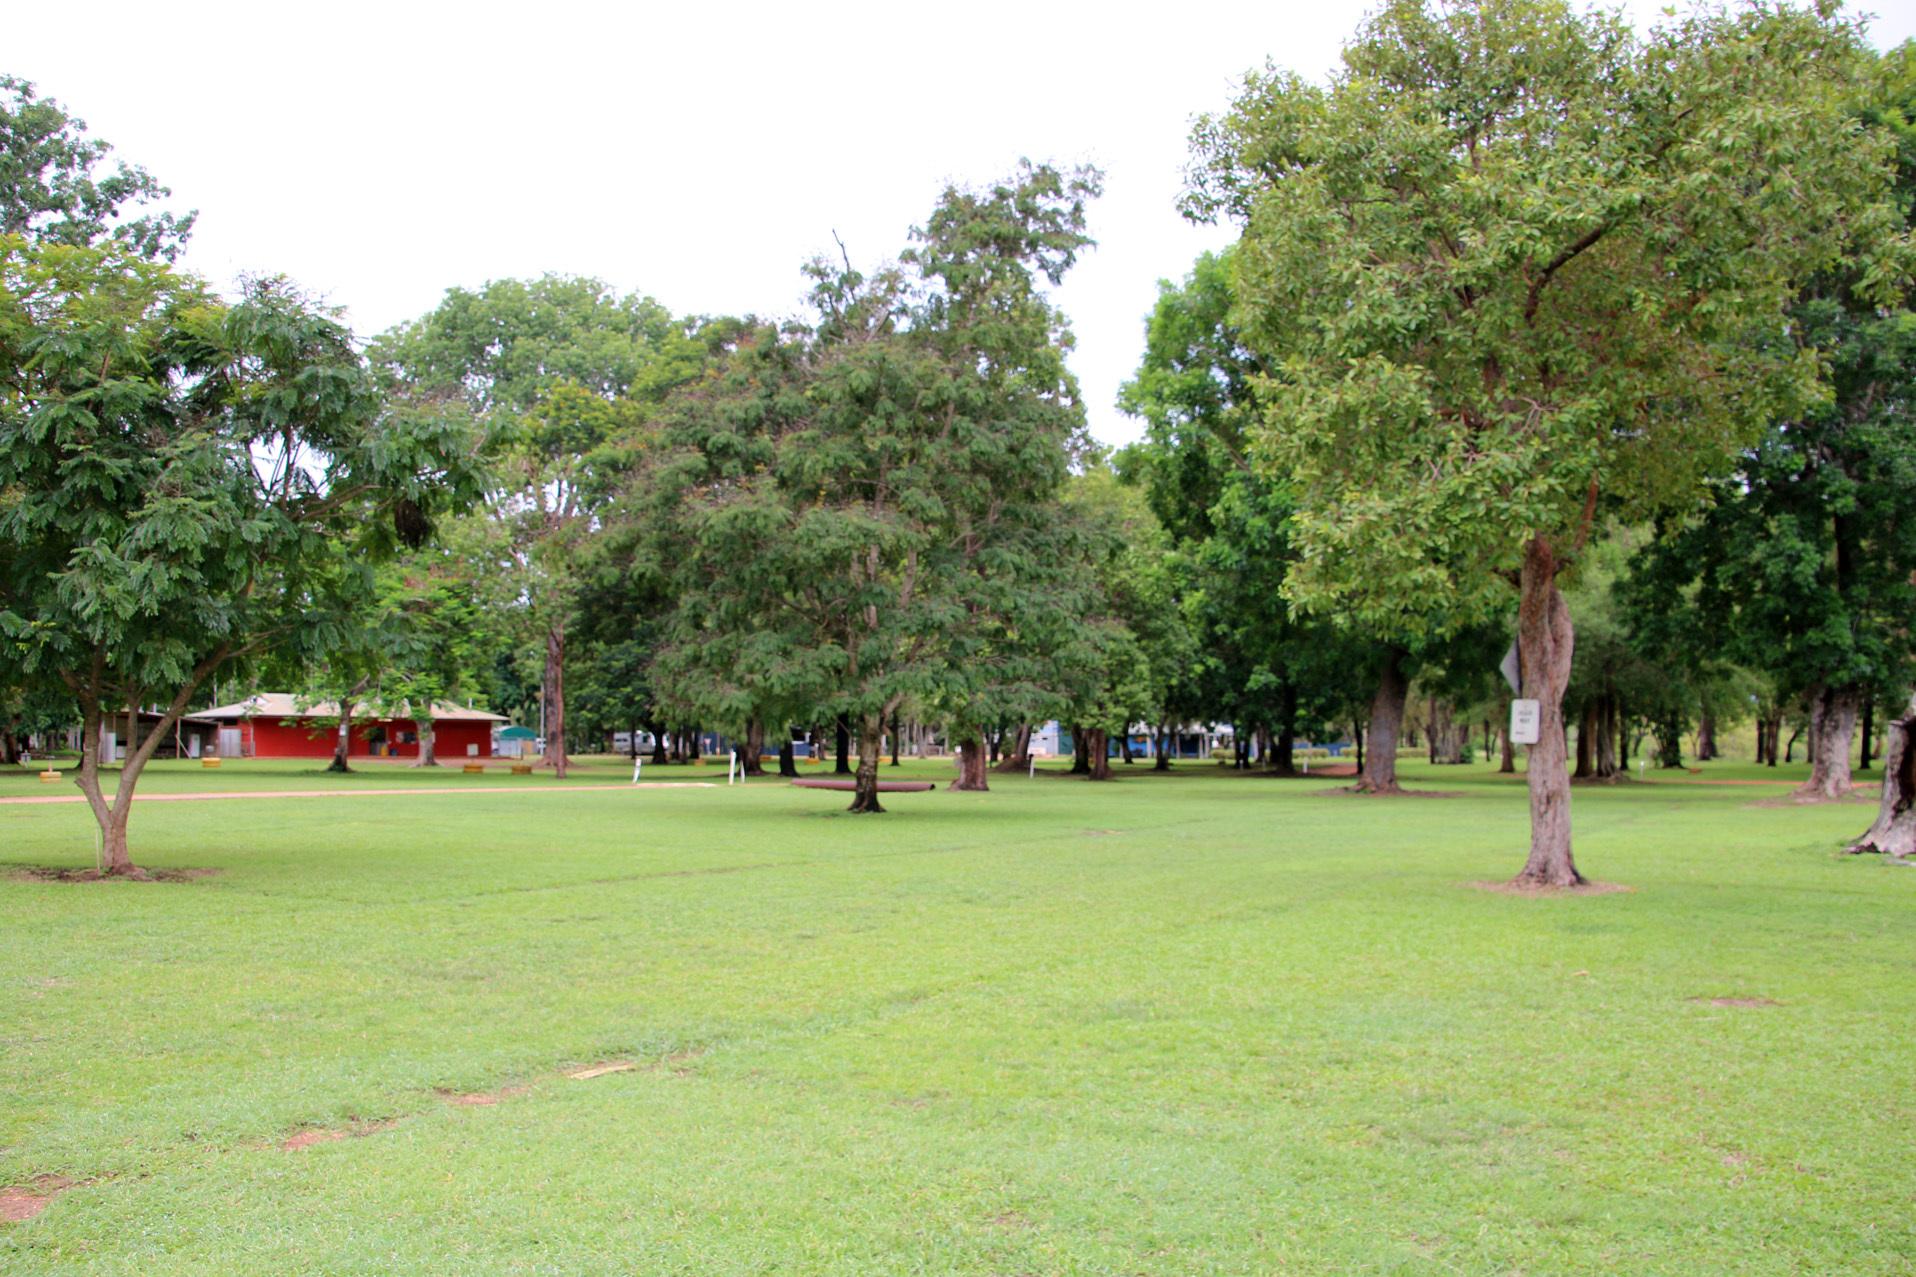 g - Weipa Caravan Park & Camping Ground